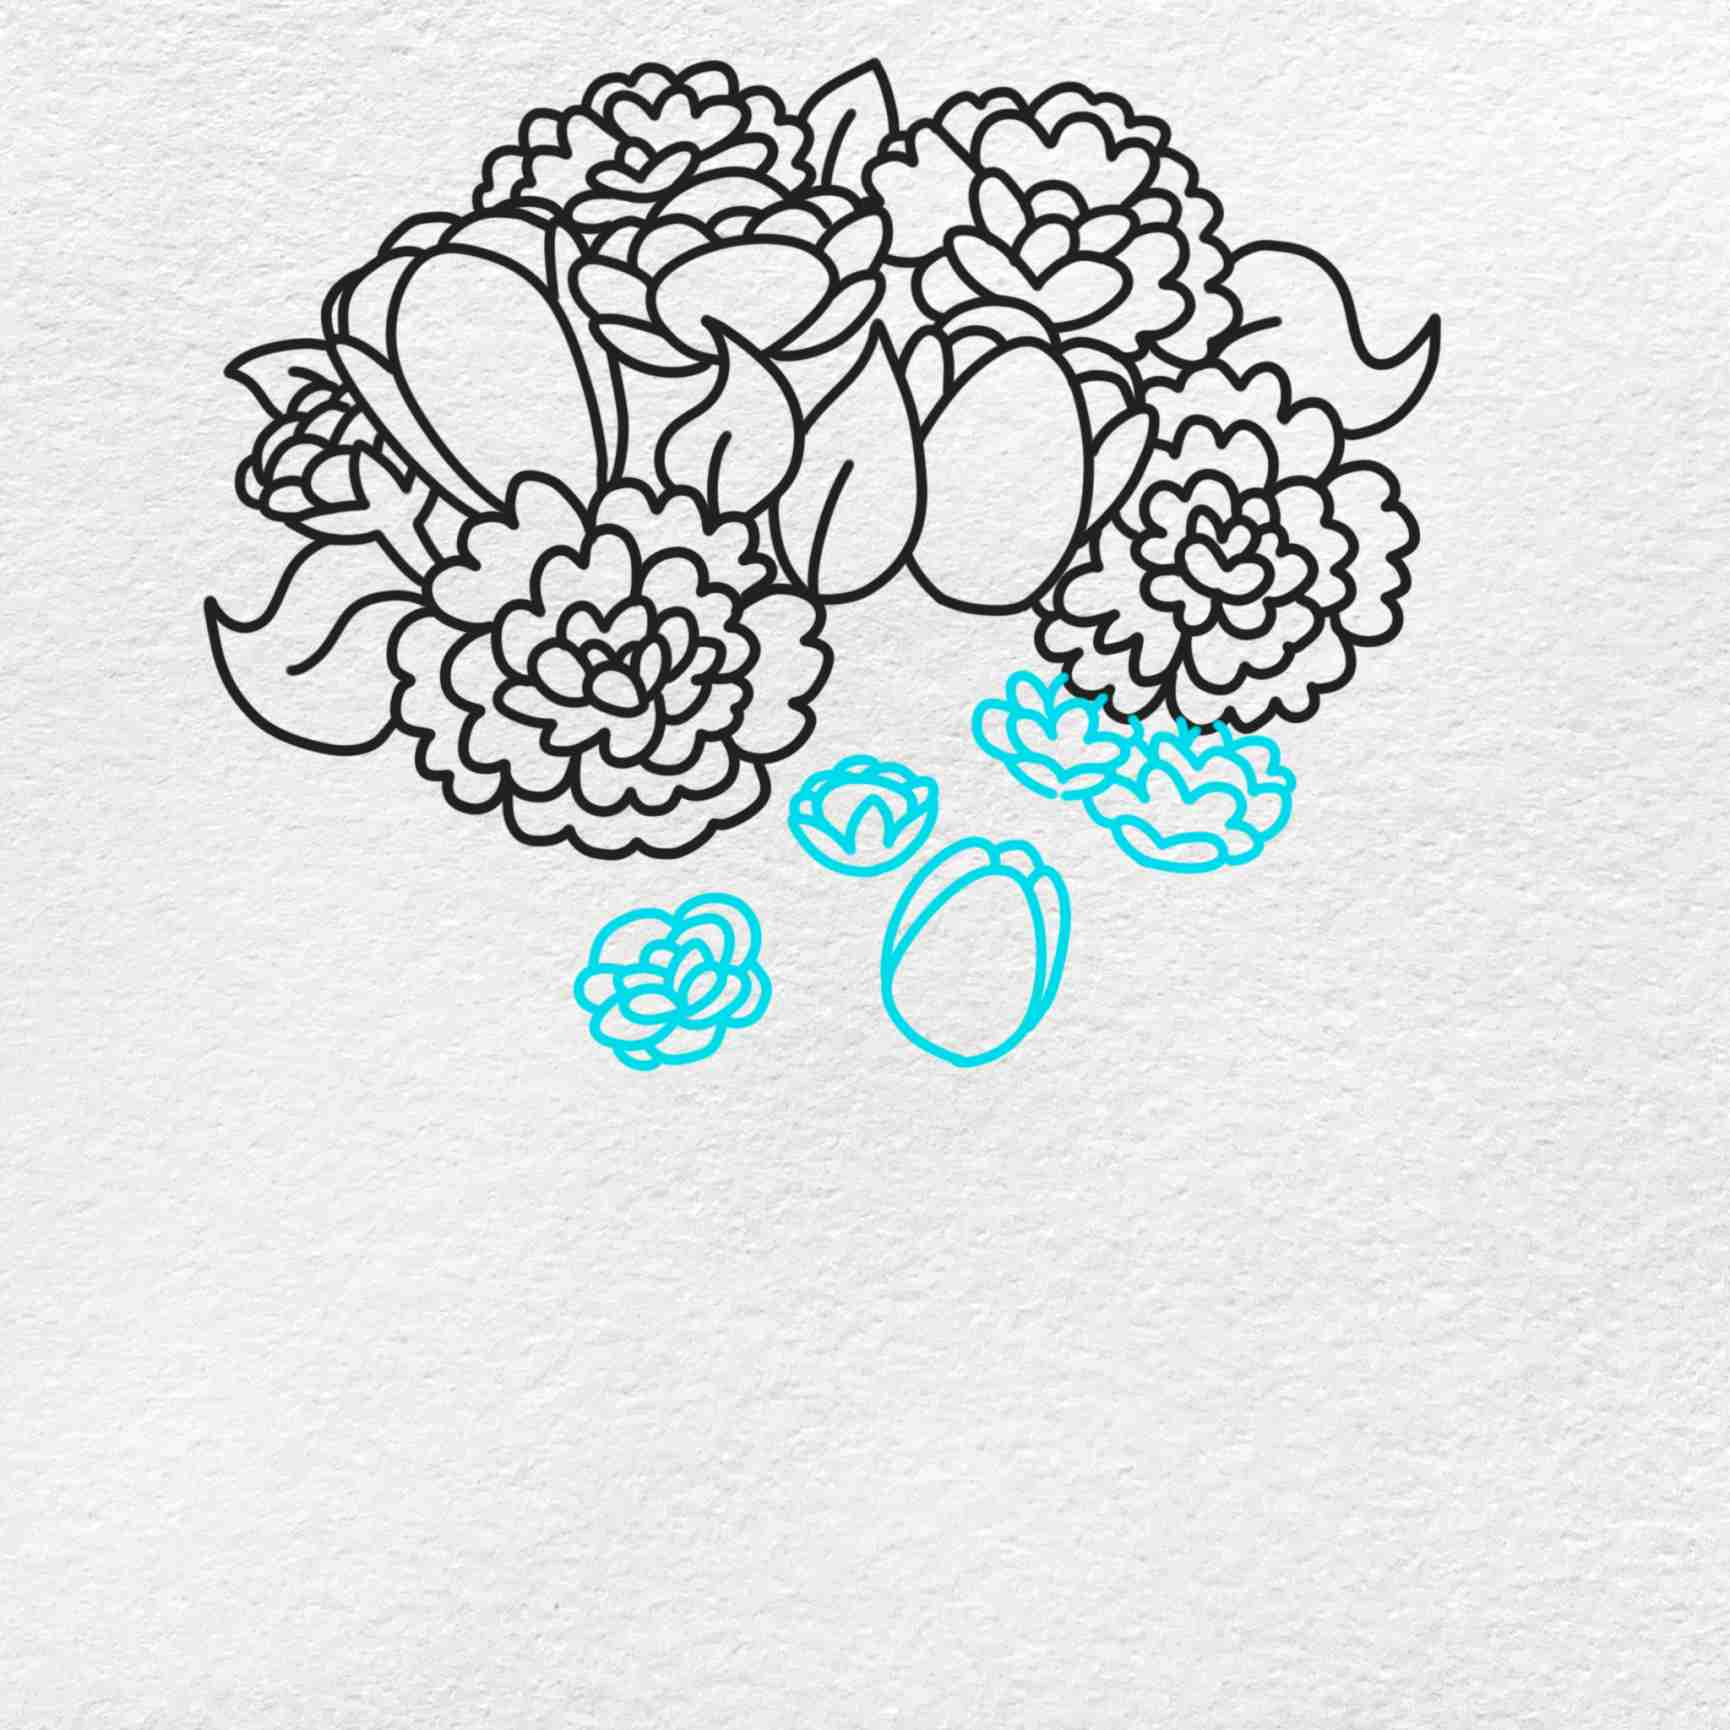 Spring Flowers Drawing: Step 6